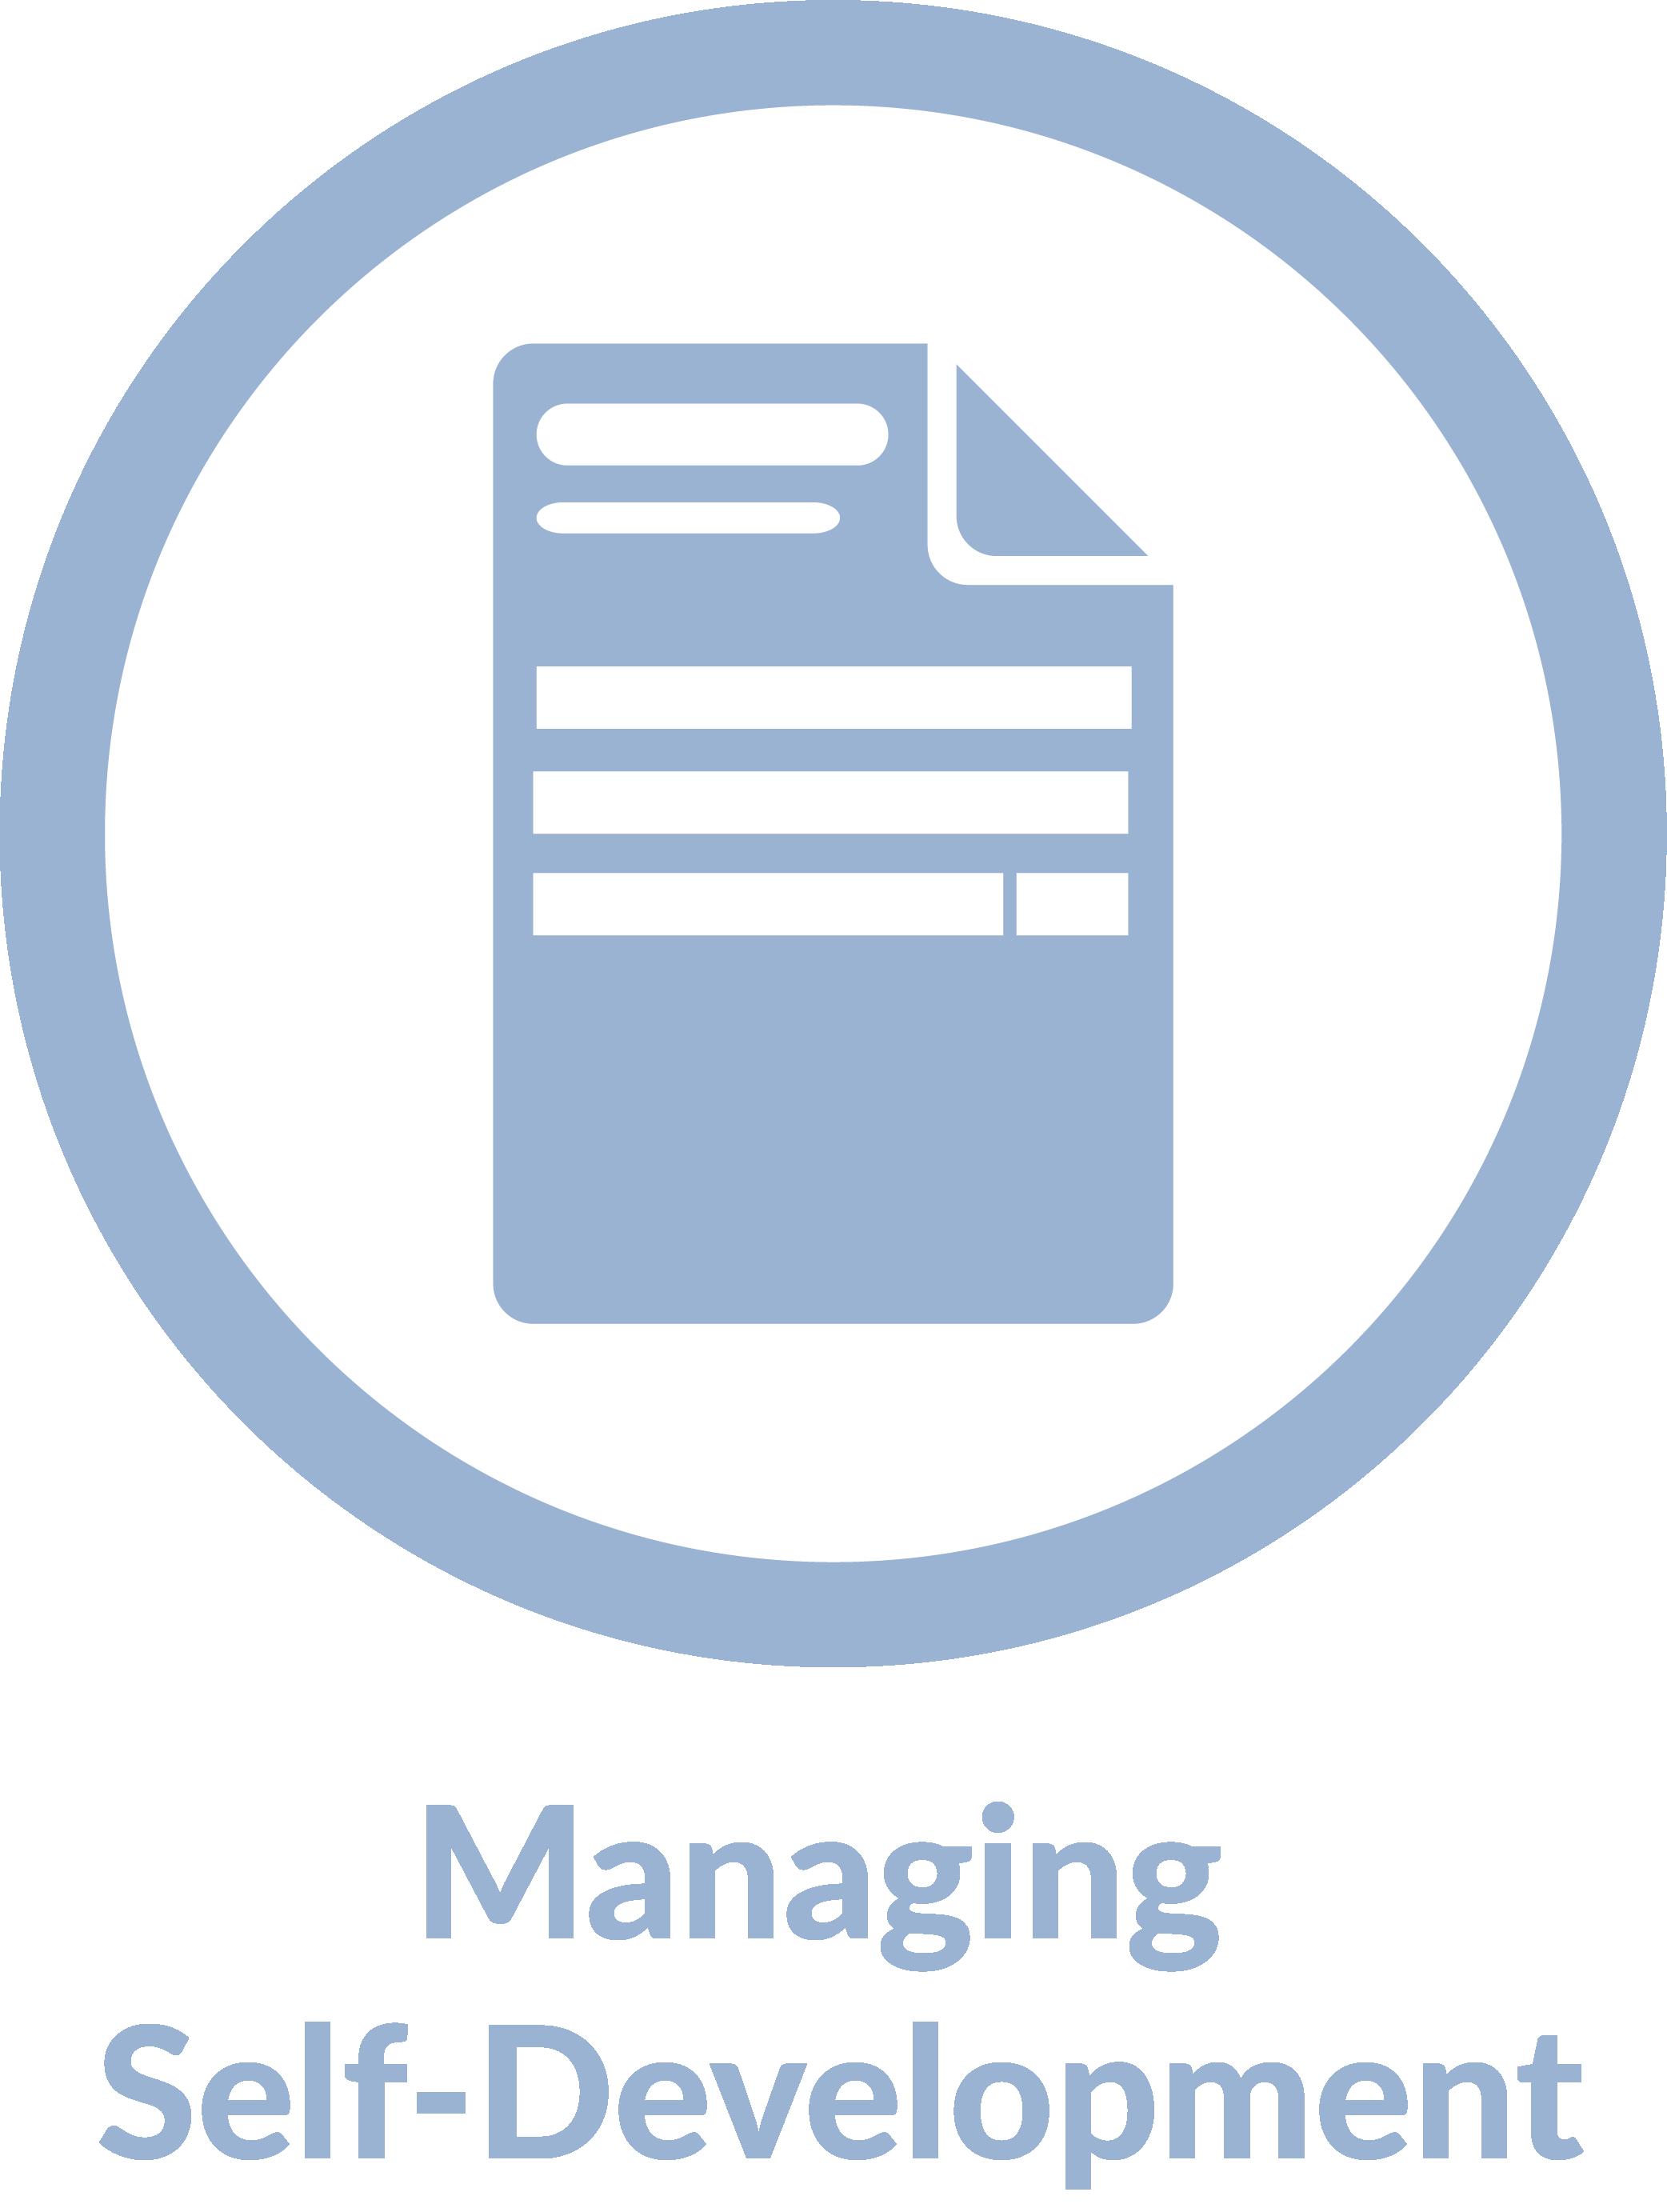 Super Admin logo and text managing self-dev